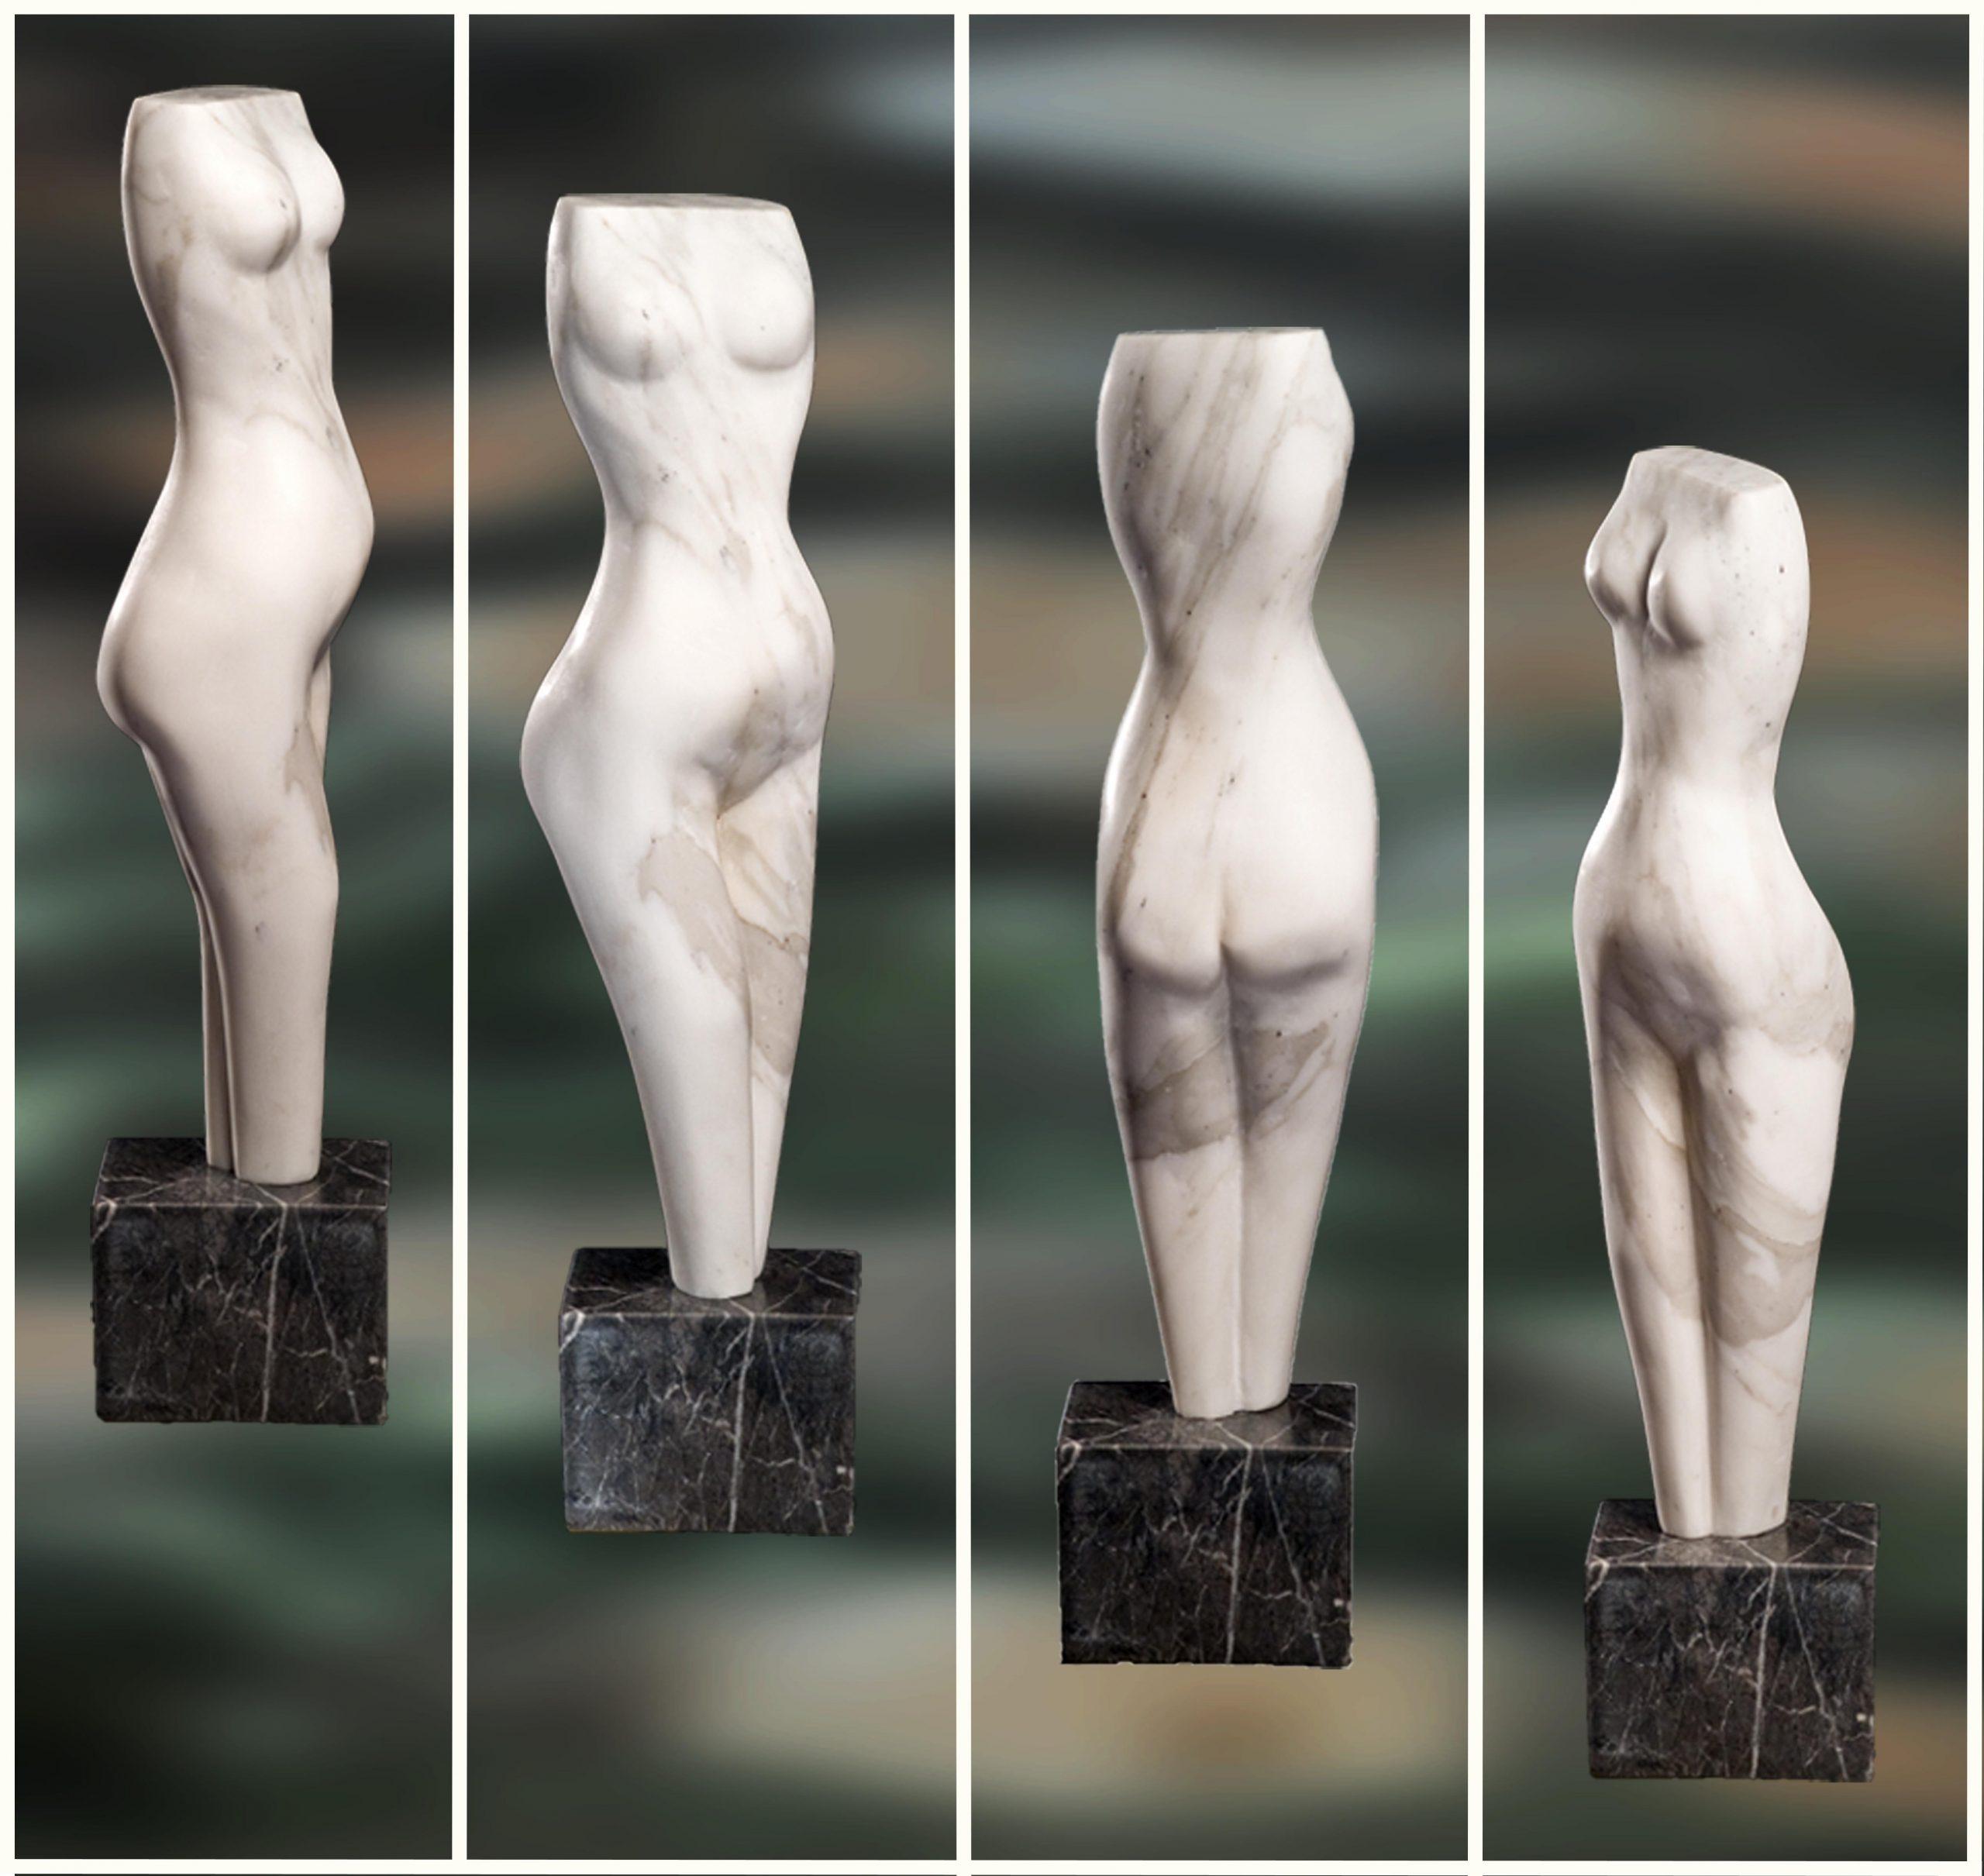 Torso ii - Calacata marmer - 65 x 15 x 13 cm